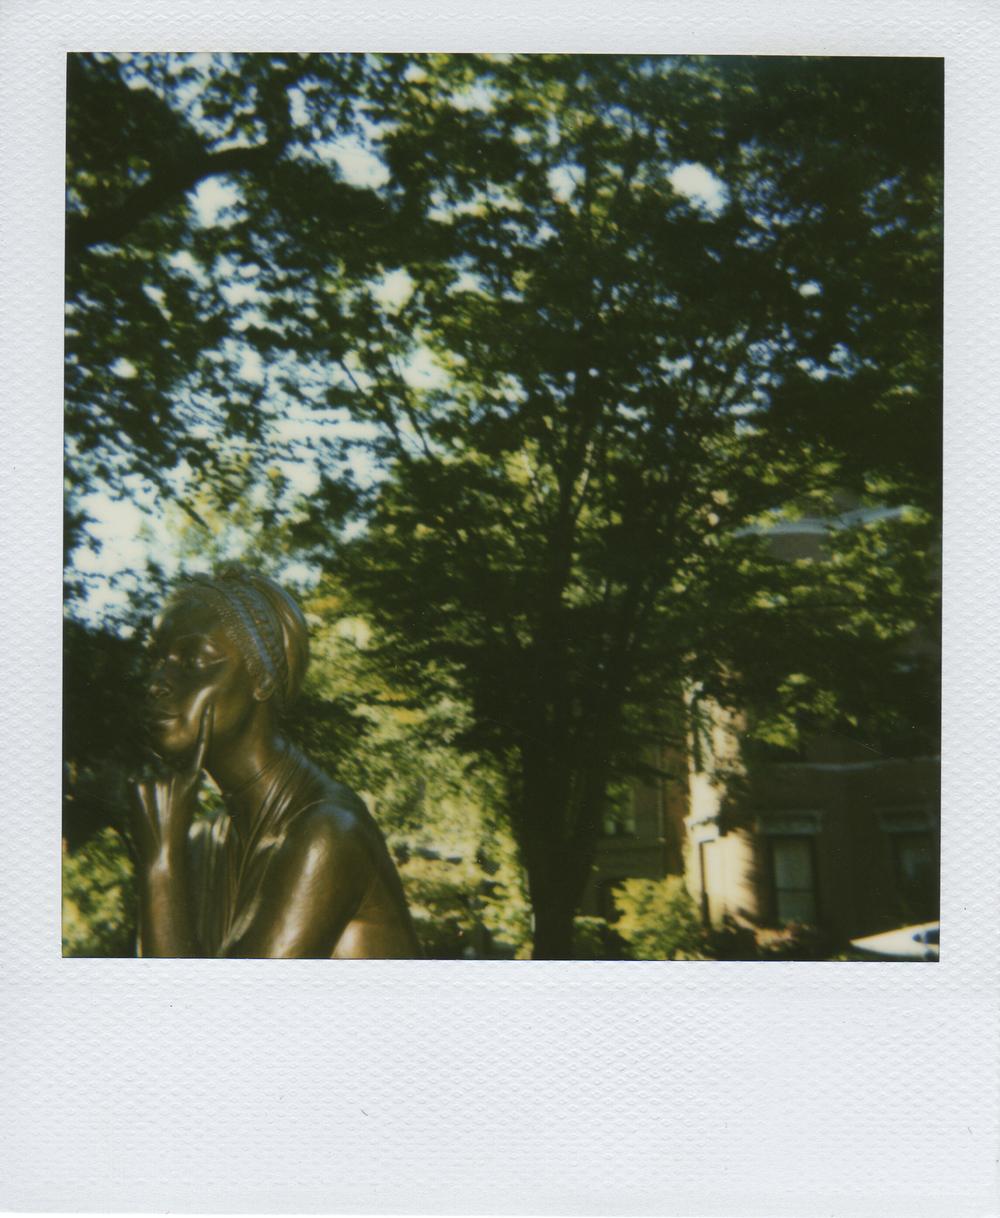 jlaurence-polaroid-154.jpg